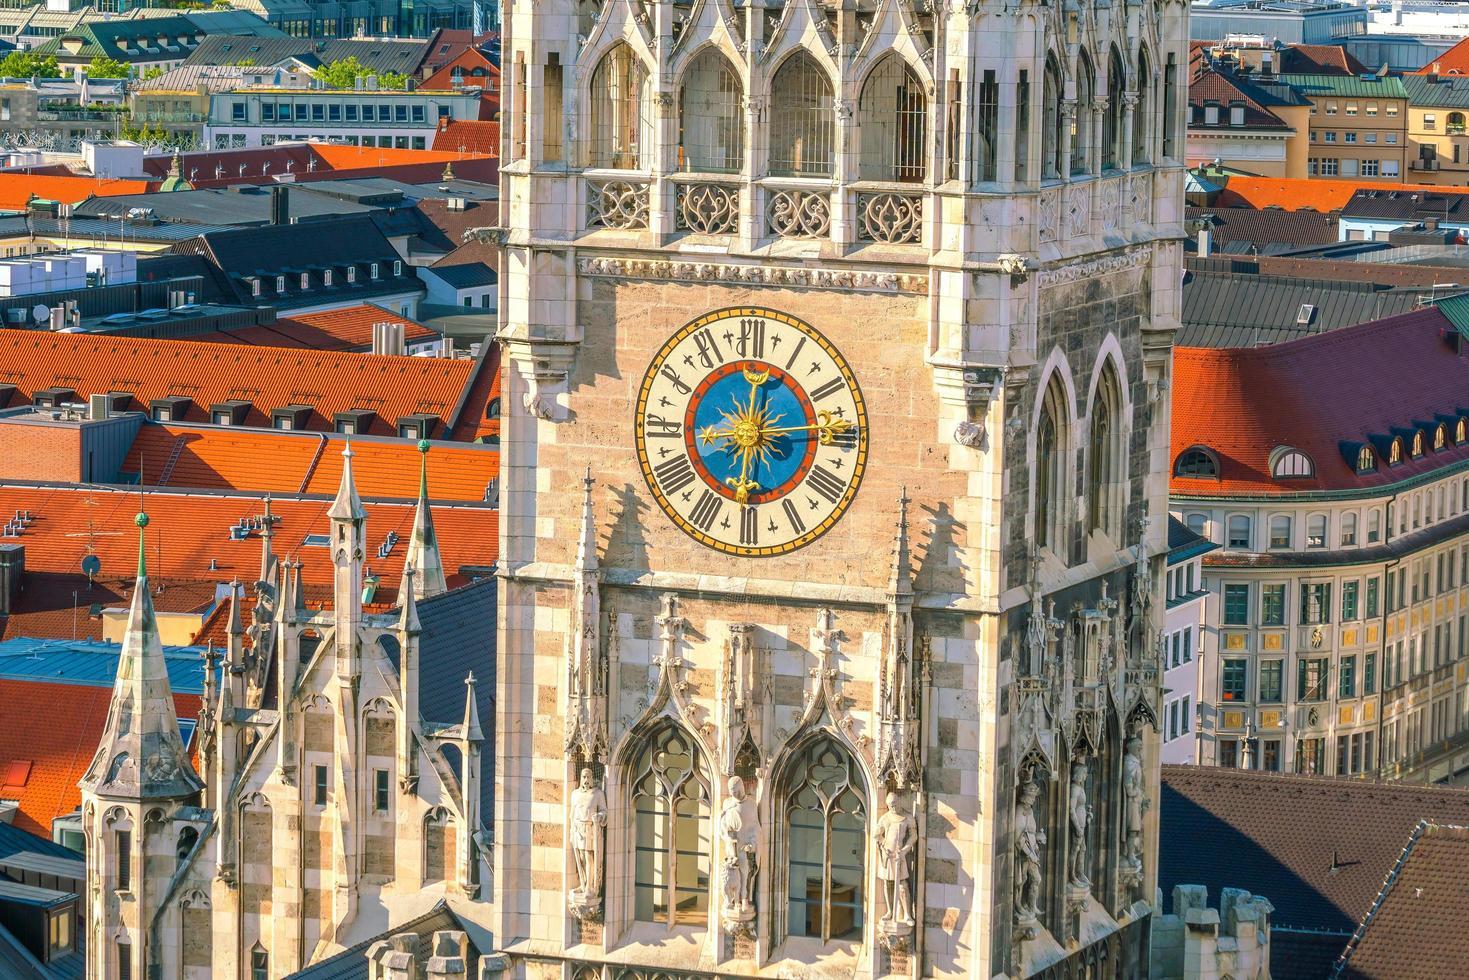 Marienplatz municipio torre dell'orologio foto